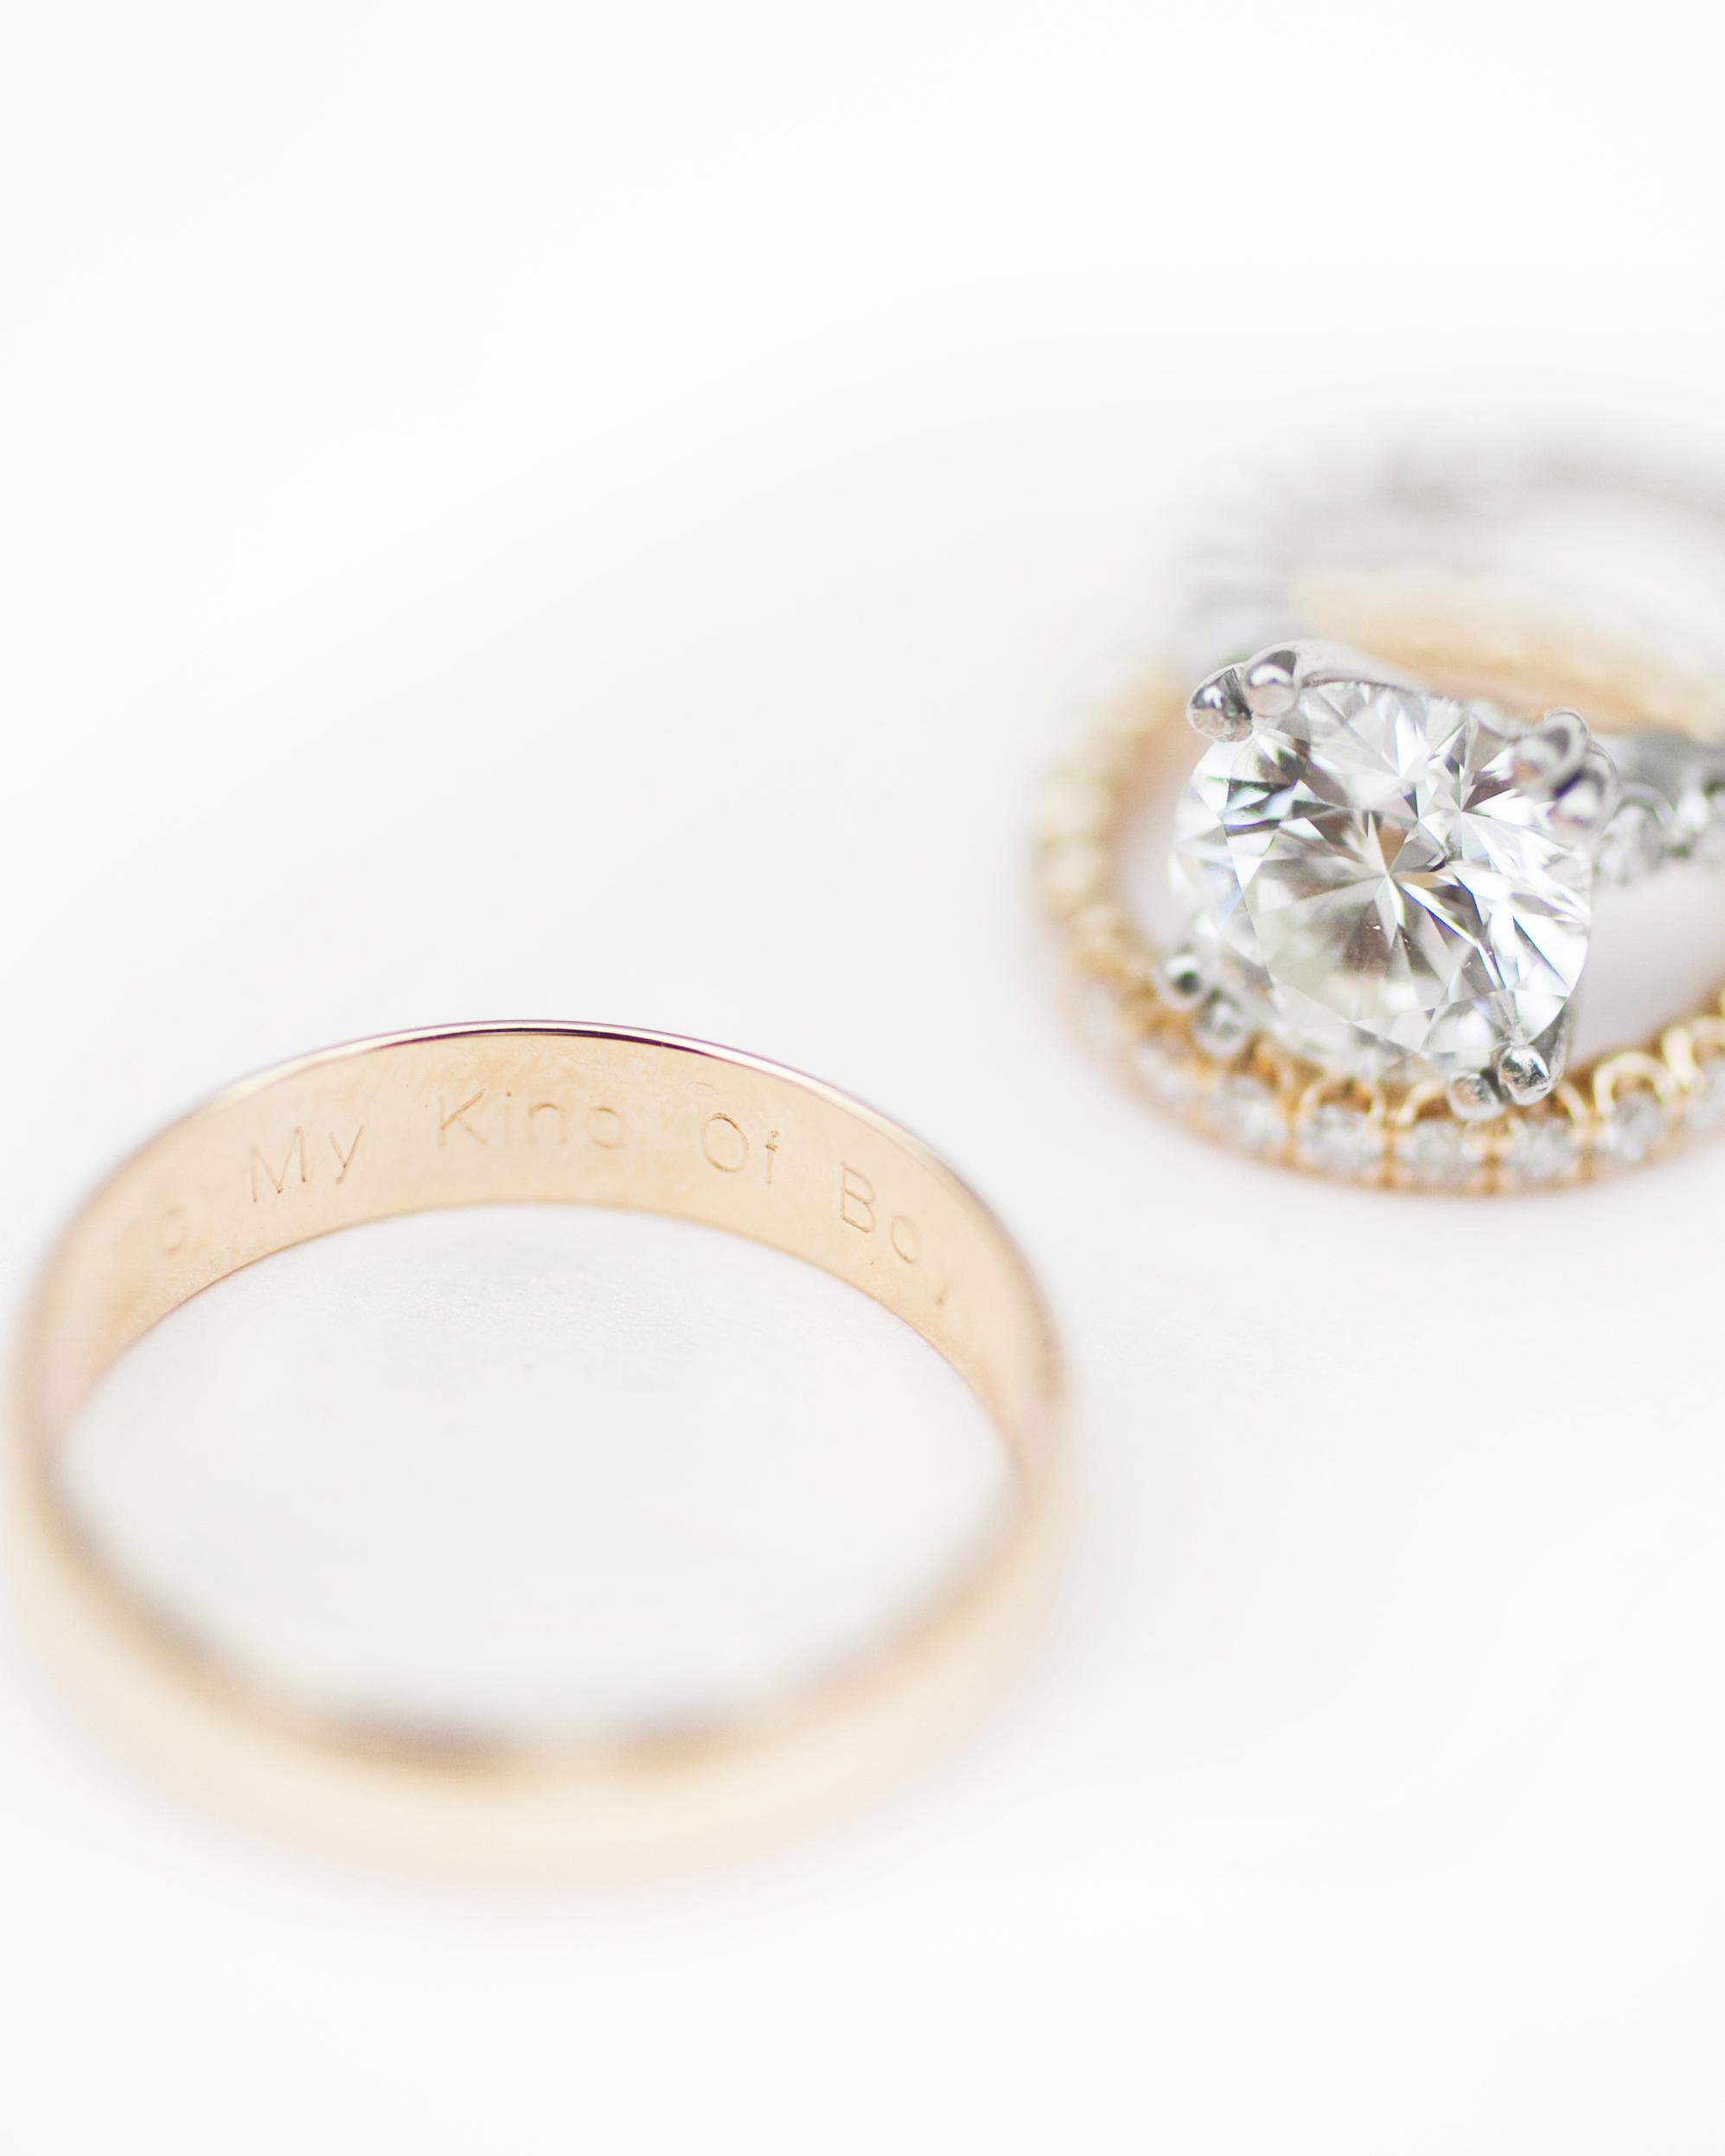 molly-patrick-wedding-rings-3561-s111760-0115.jpg